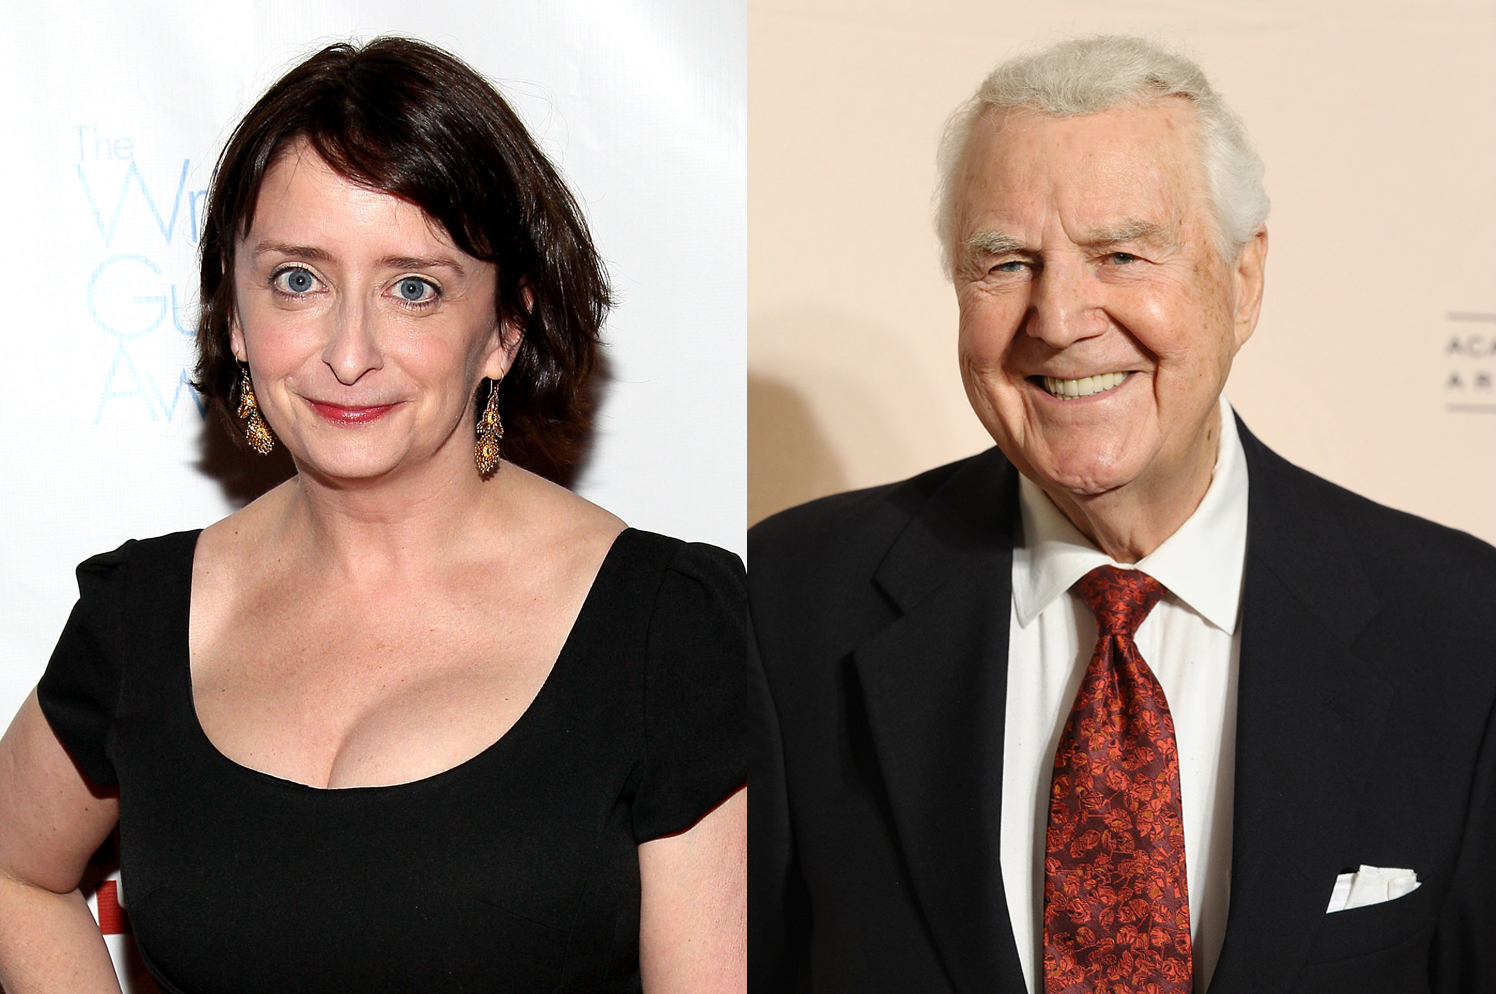 Rachel Dratch and Don Pardo.